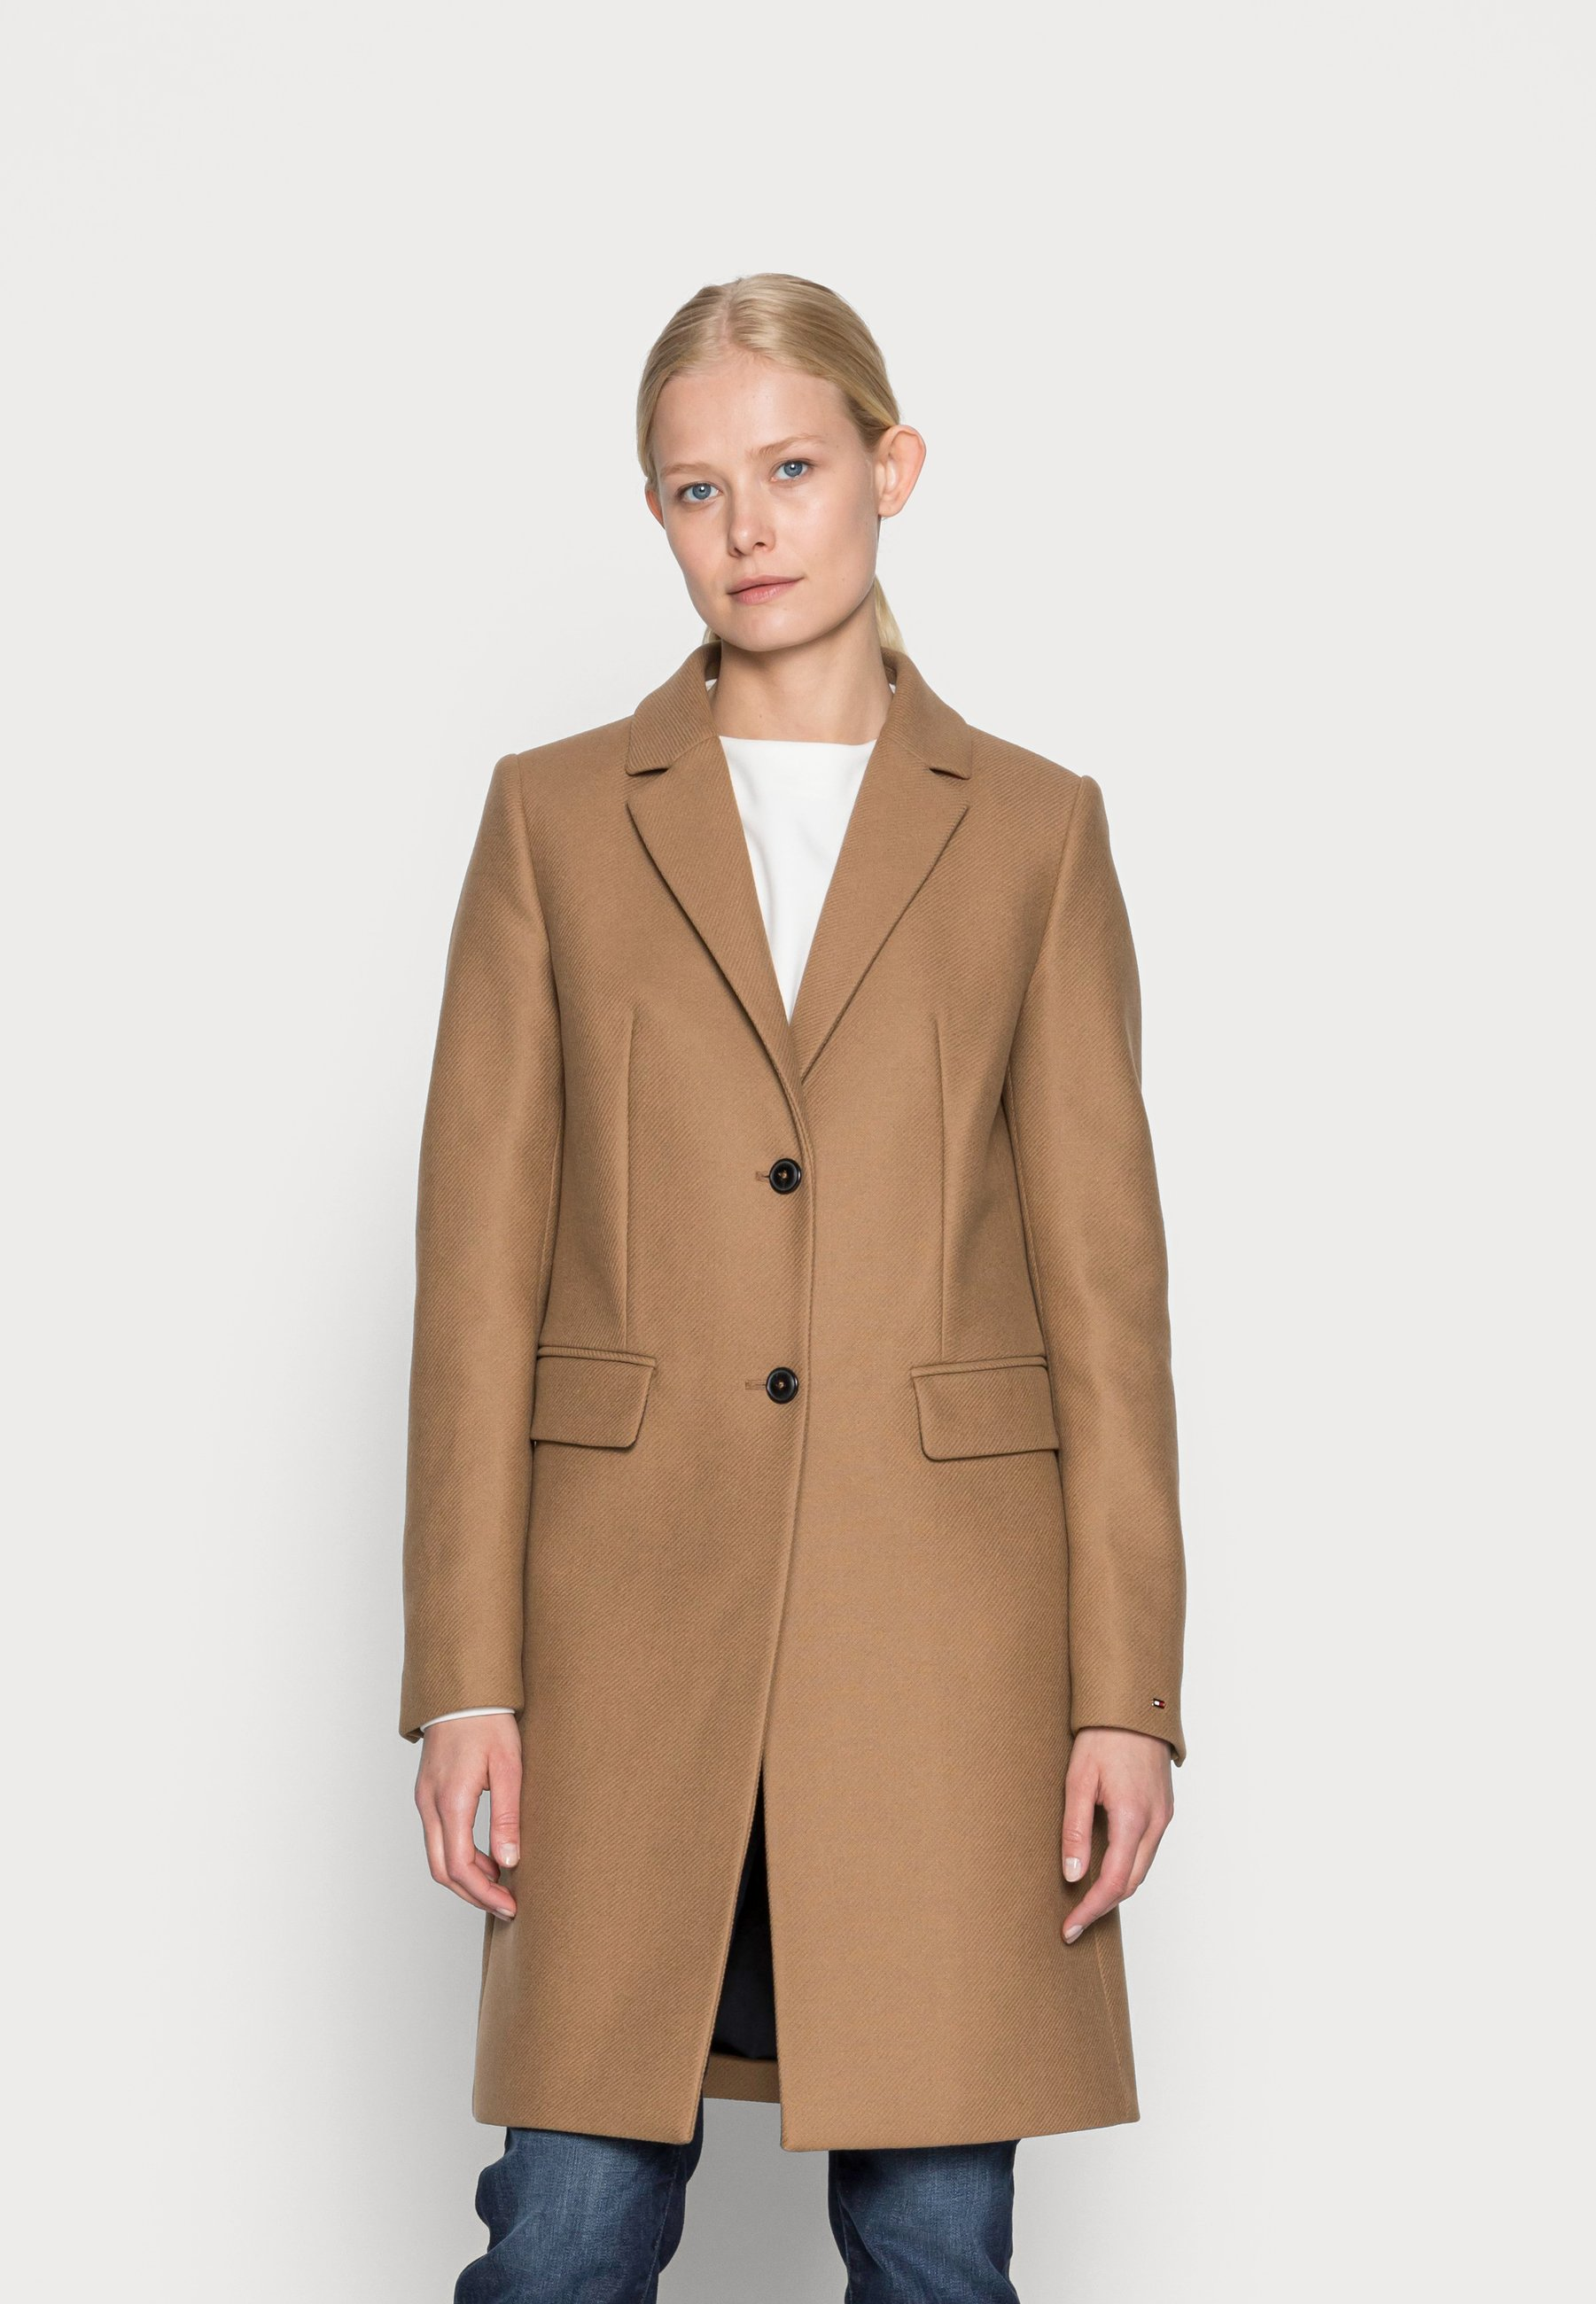 Femme CLASSIC COAT - Manteau classique